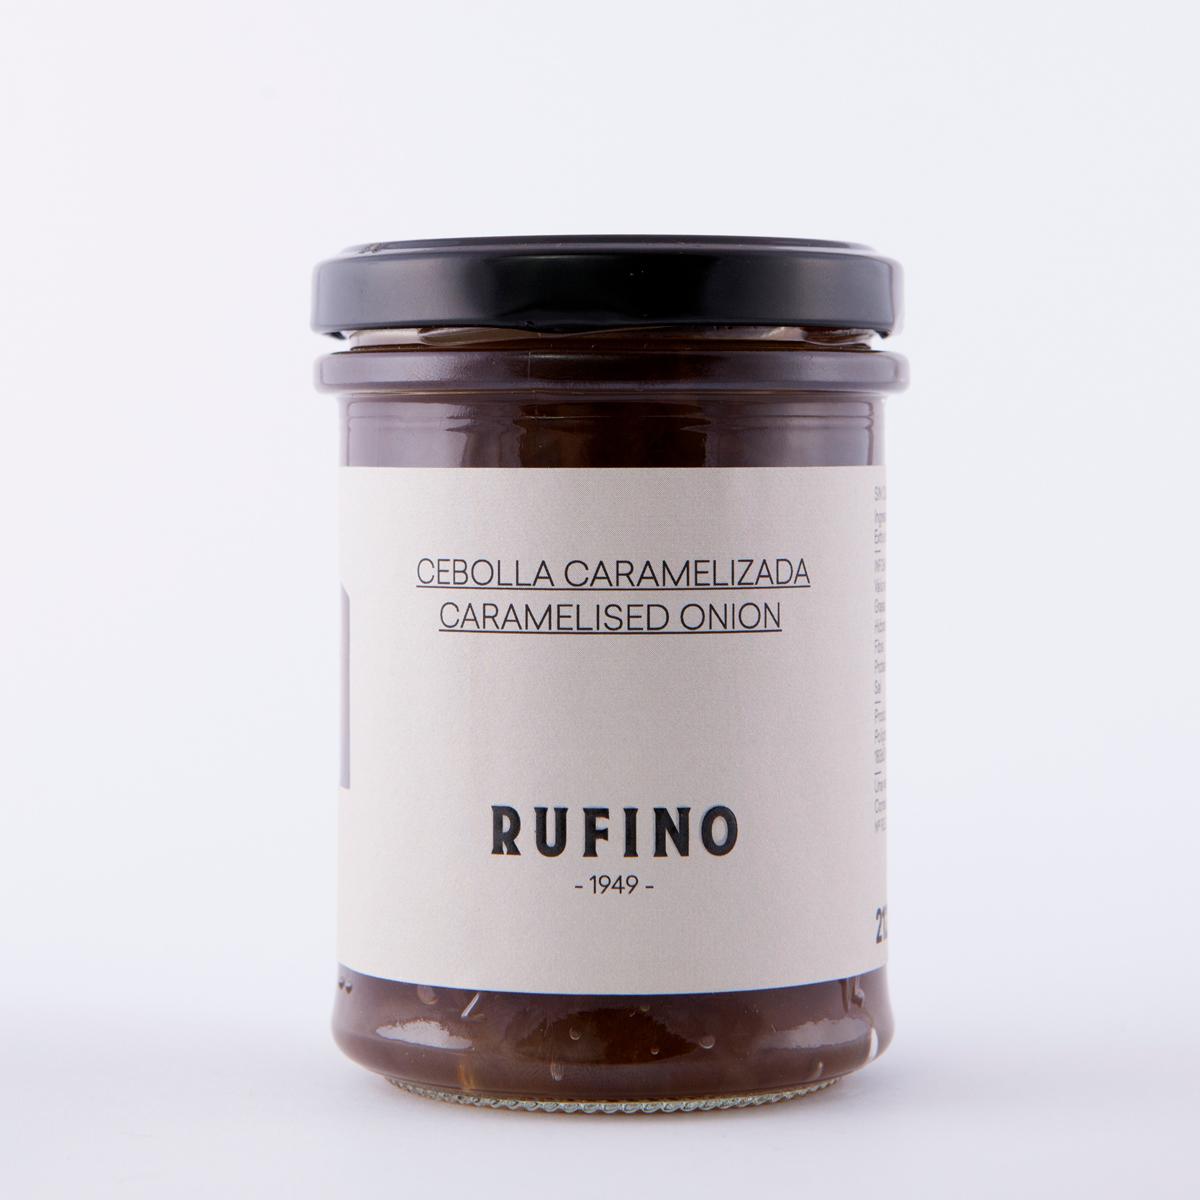 mermeladas-rufino-cebolla-caramelizada